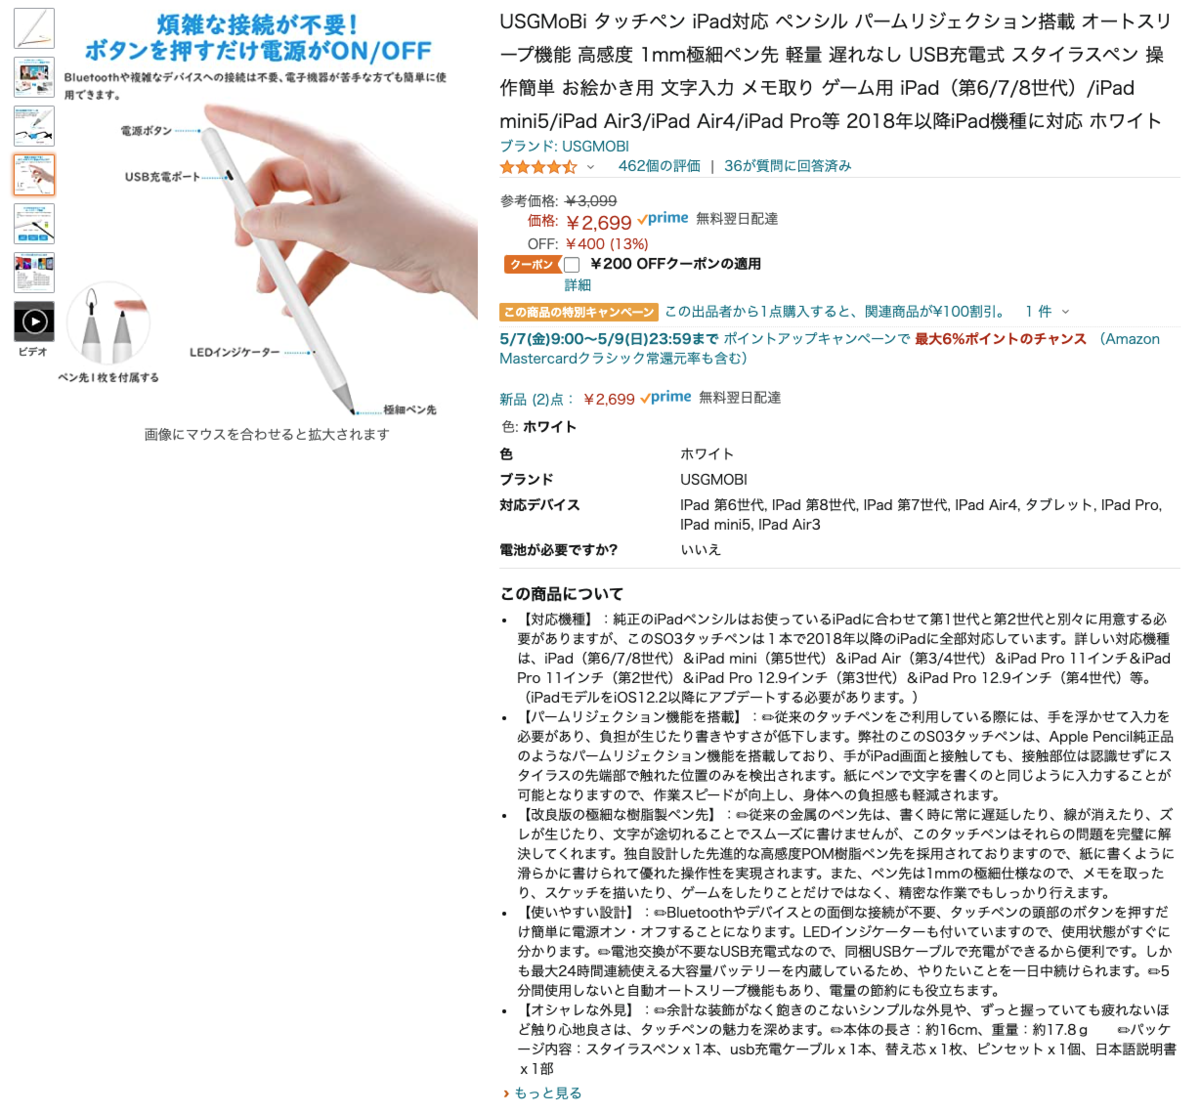 f:id:takashineozeon:20210507201811p:plain